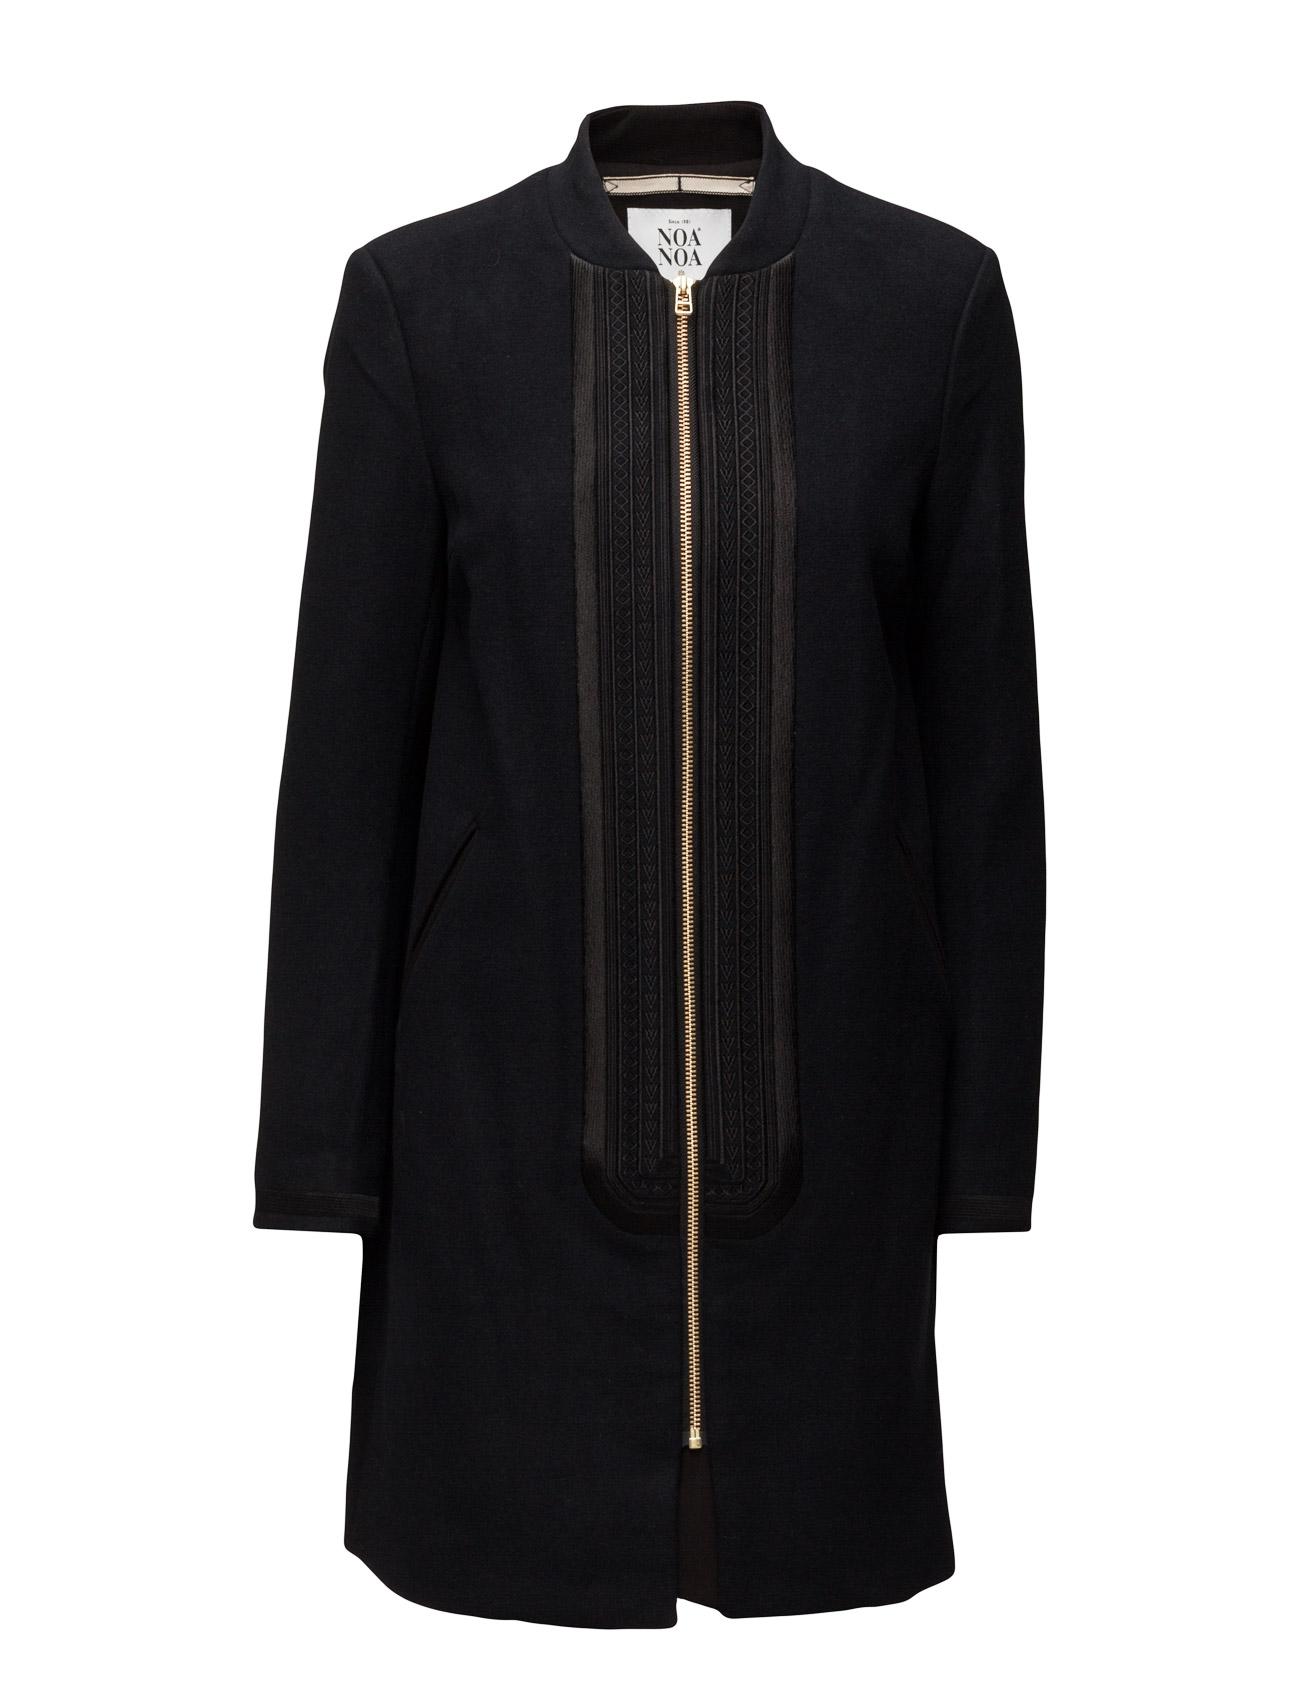 Light Outerwear Noa Noa Frakker til Kvinder i Mørk Navy